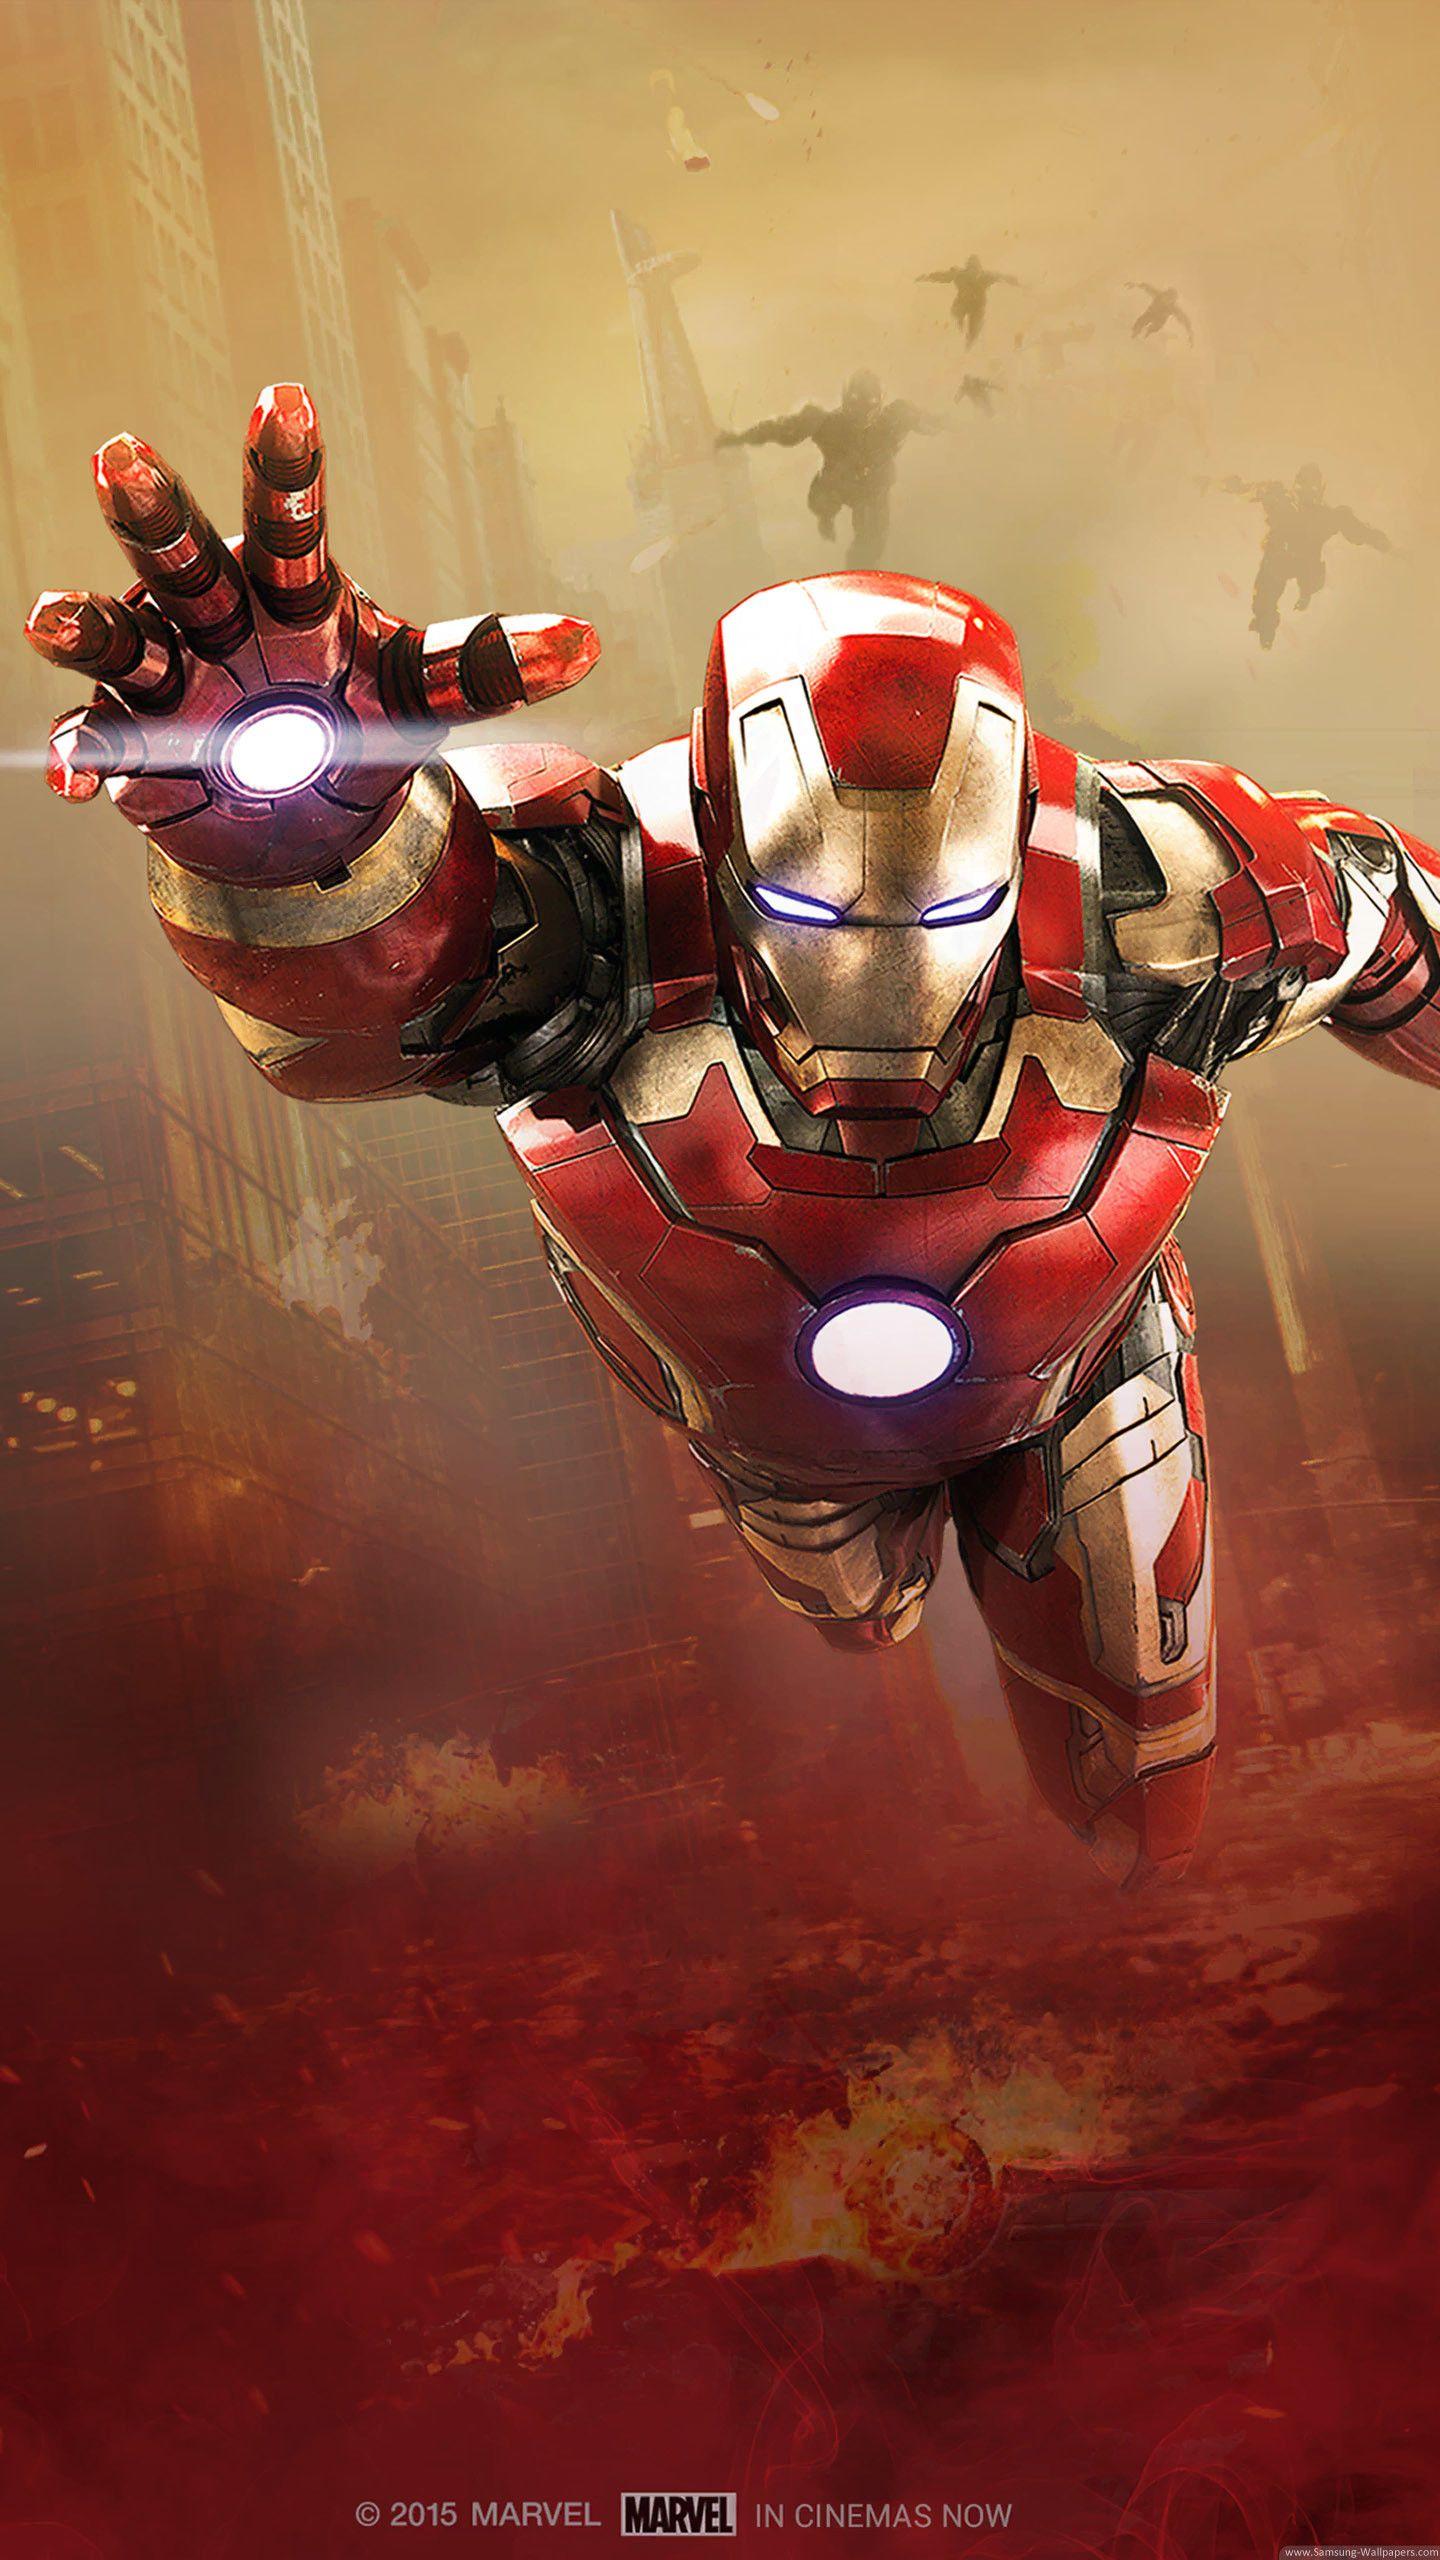 Iron Man Wallpaper Mobile In 2020 Iron Man Hd Wallpaper Iron Man Art Iron Man Wallpaper